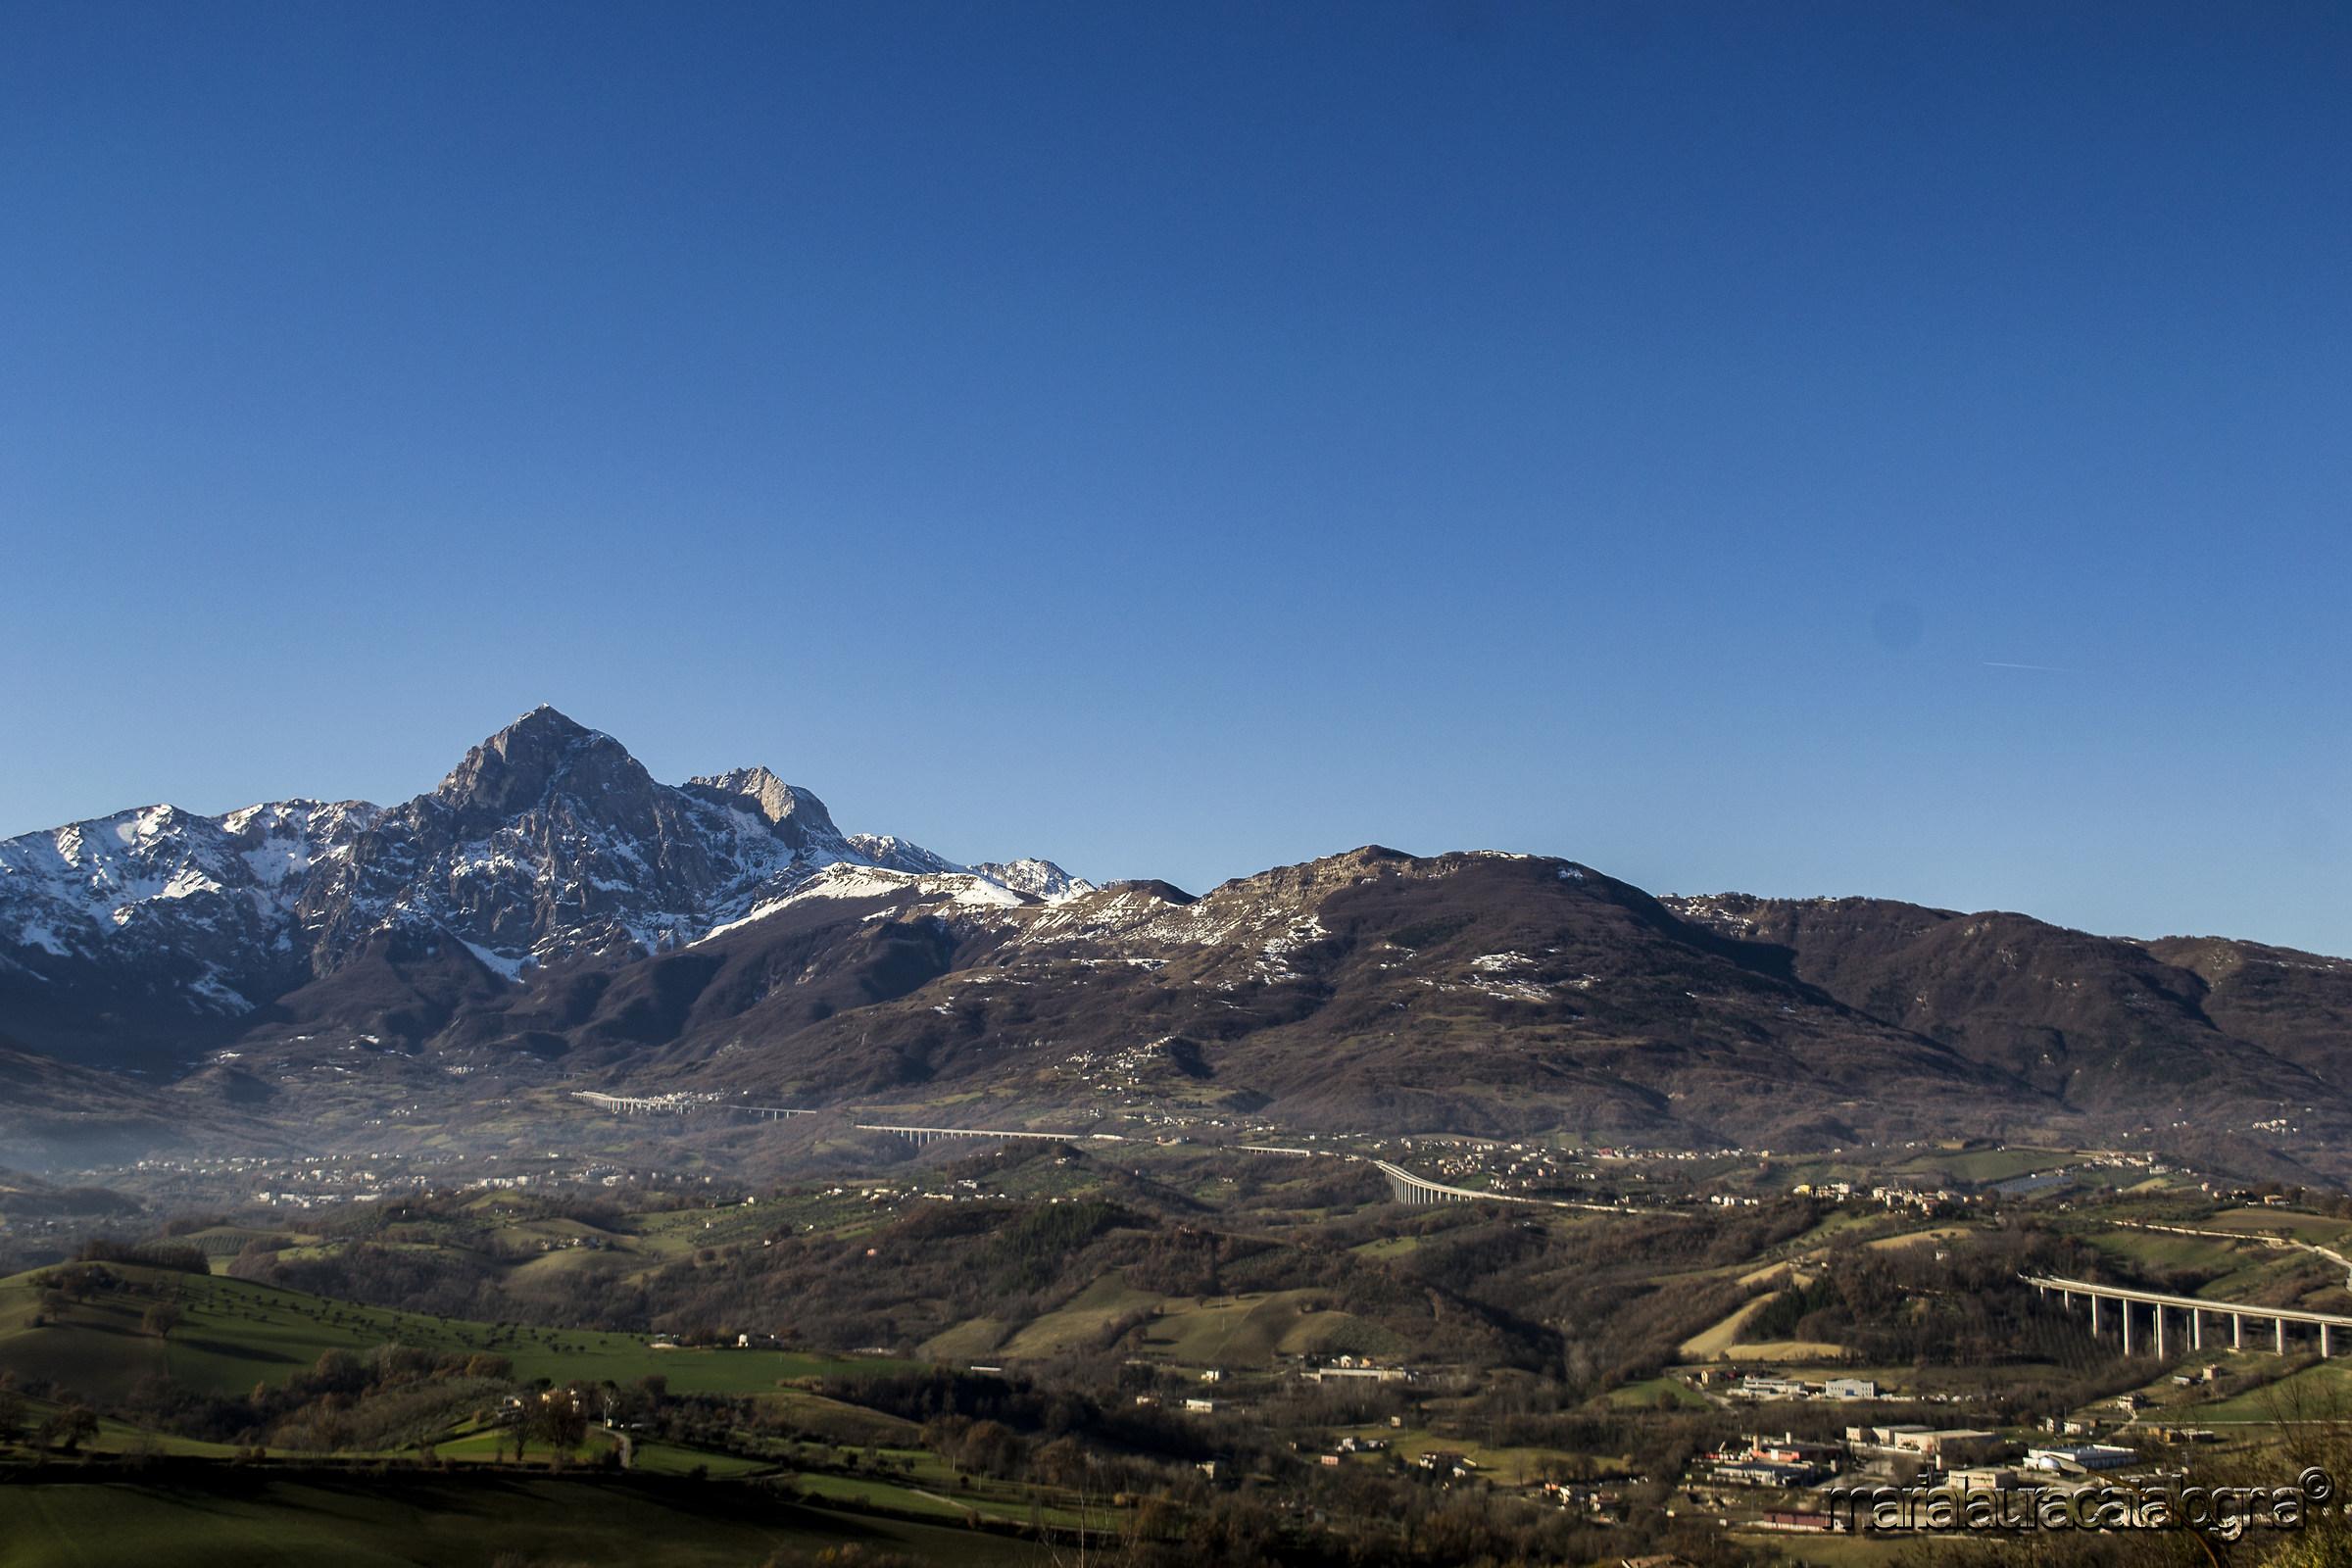 The Gran Sasso seen from Castel Castagna...